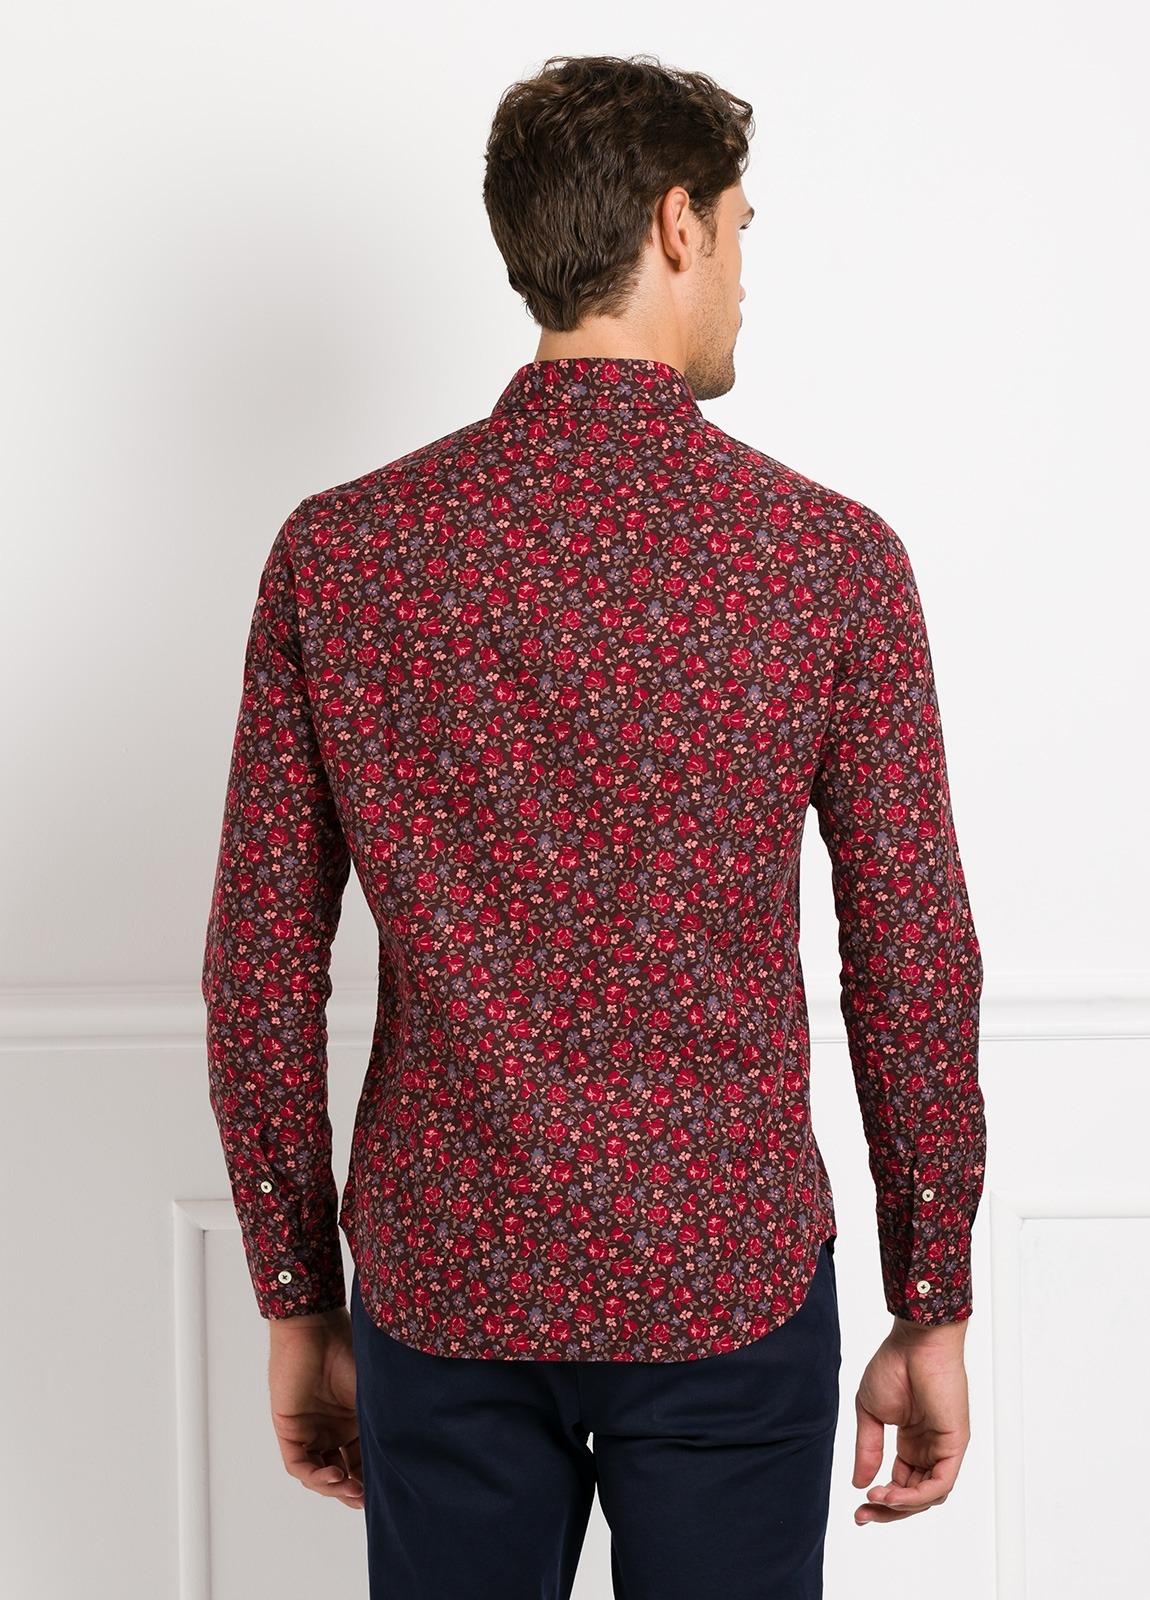 Camisa Leisure Wear SLIM FIT modelo PORTO estampado flores color granate. 100% Algodón. - Ítem2